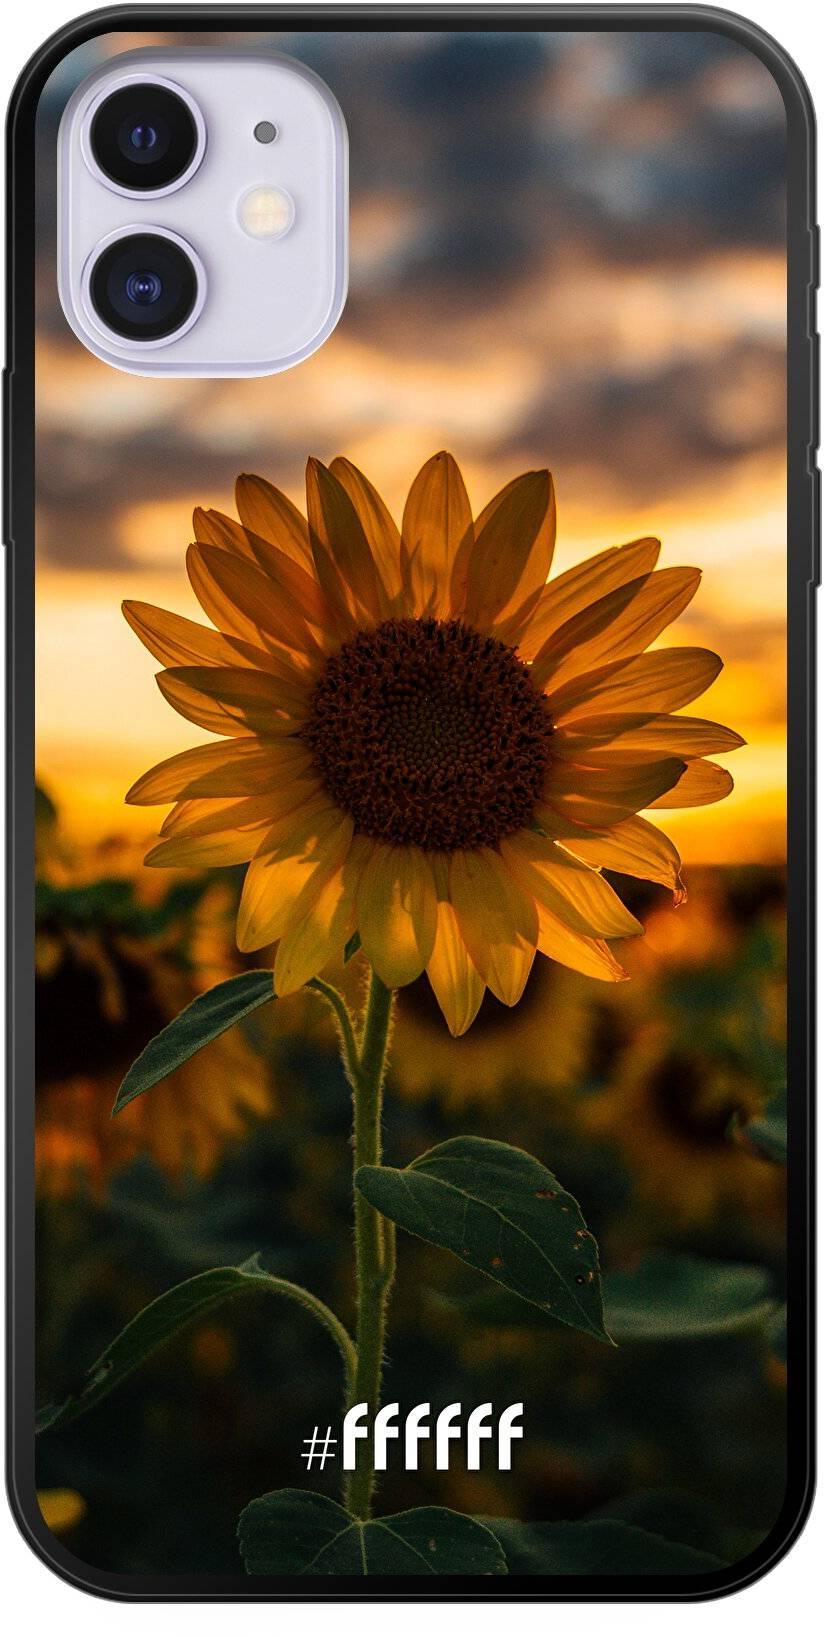 Sunset Sunflower iPhone 11